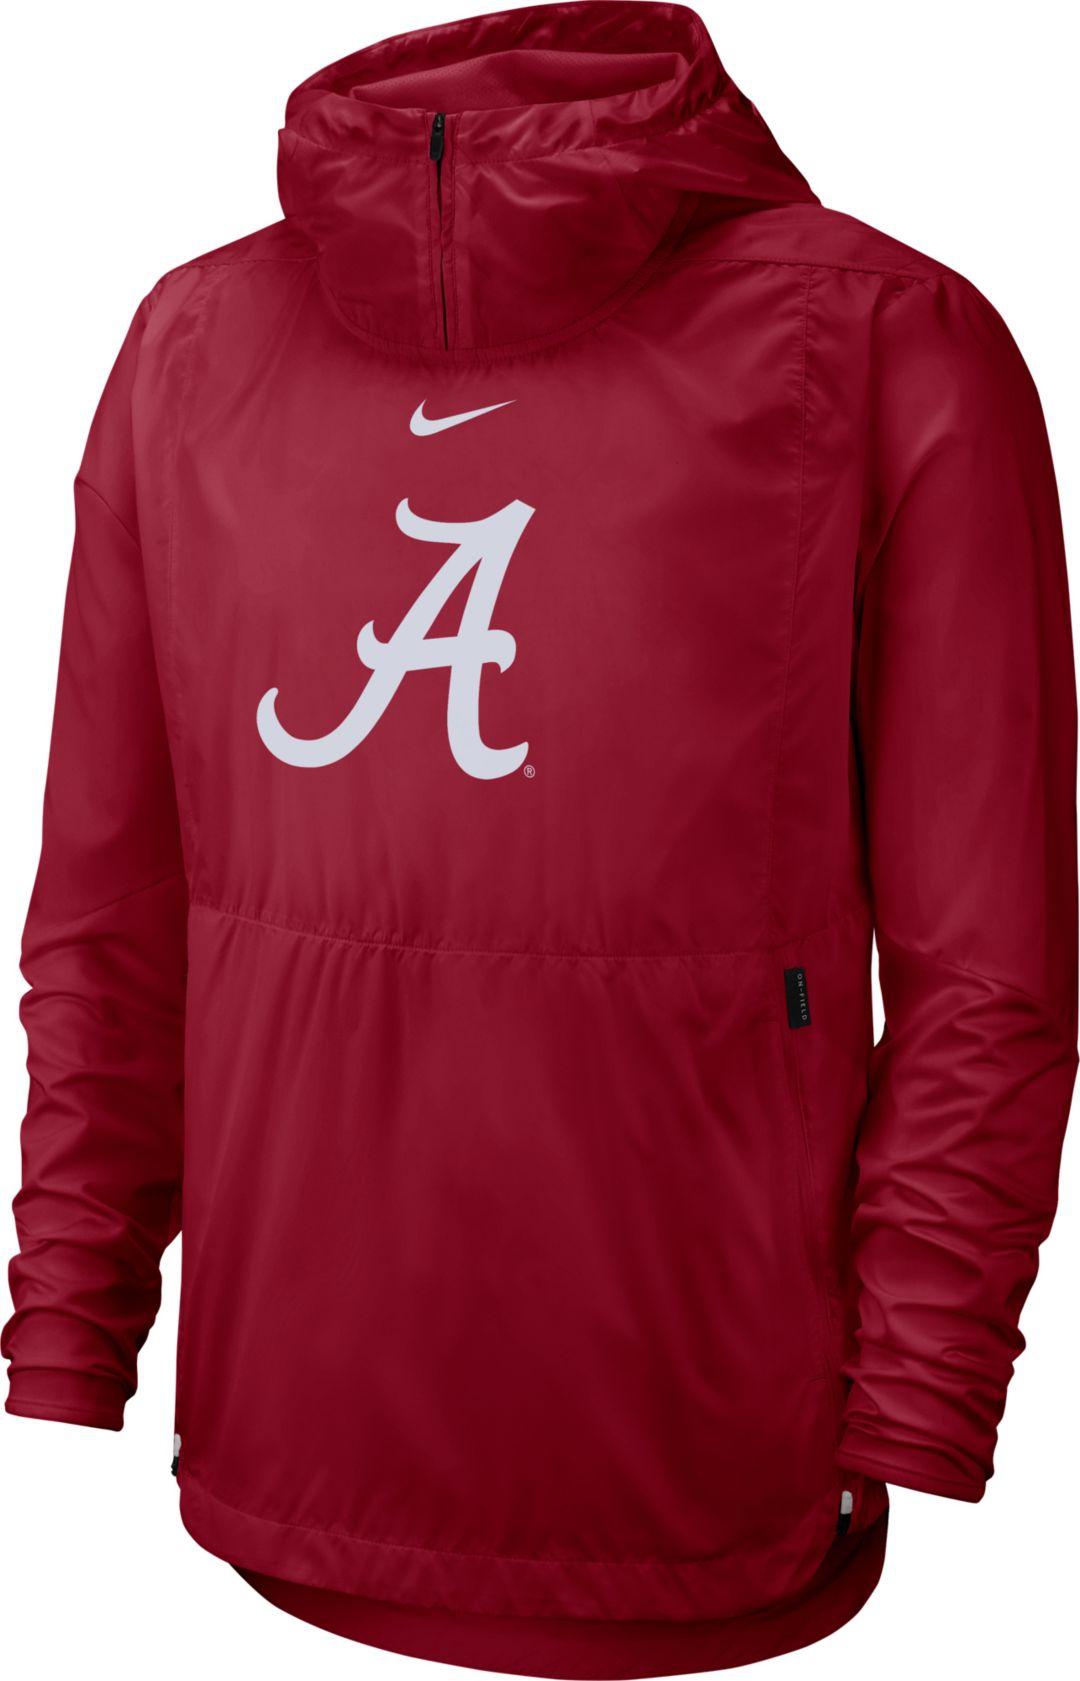 online store 7b2e9 f9d27 Nike Men's Alabama Crimson Tide Crimson Repel Football Sideline Player  Pullover Hoodie